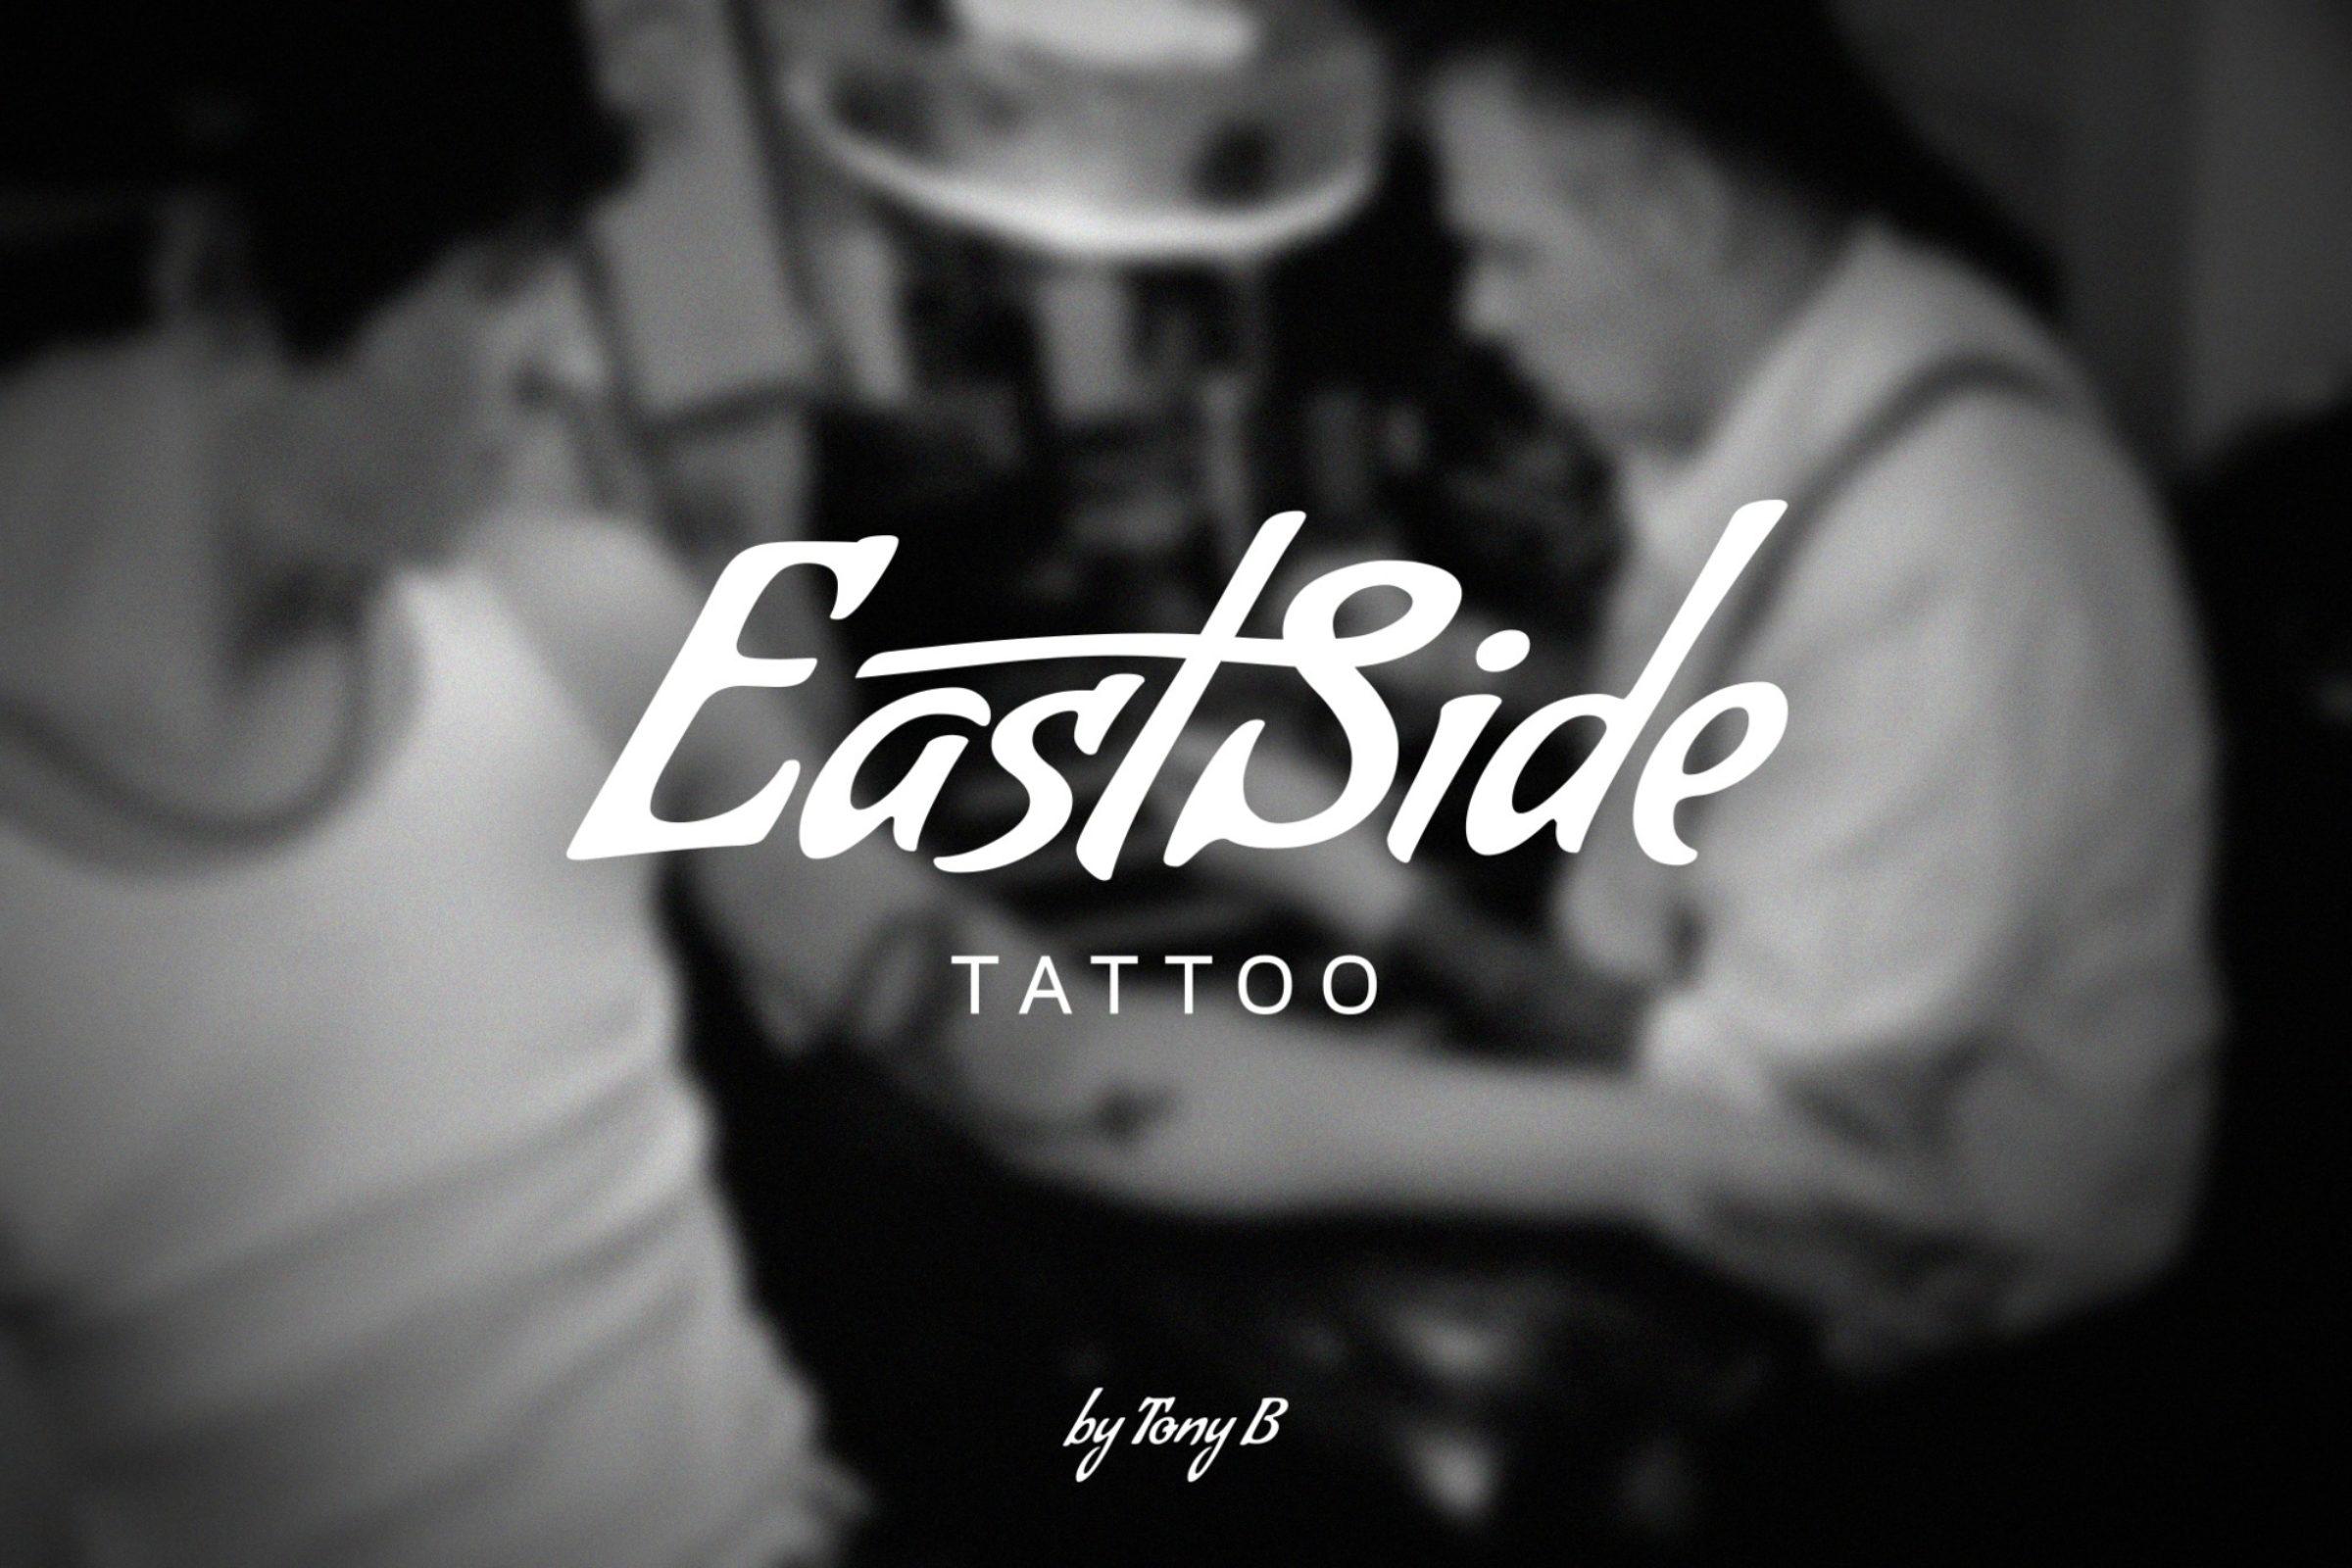 00 Logo Eastside Tattoo Diap